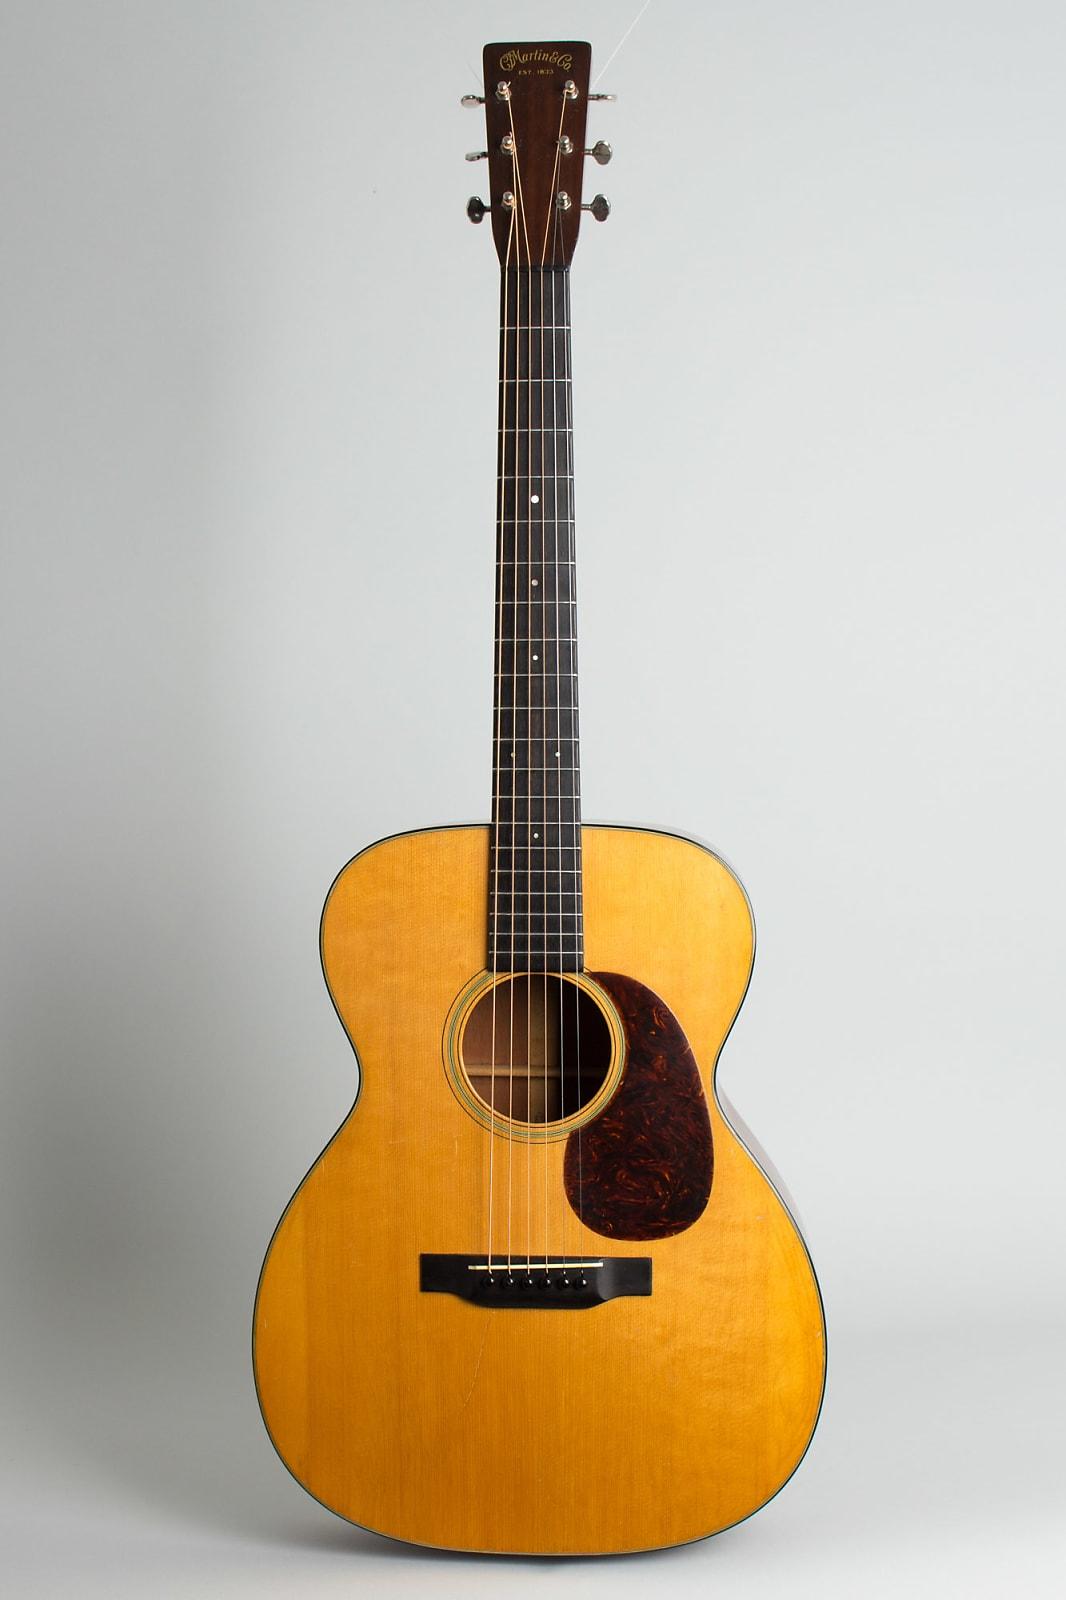 C. F. Martin  000-18 Flat Top Acoustic Guitar (1934), ser. #55289, period black hard shell case.